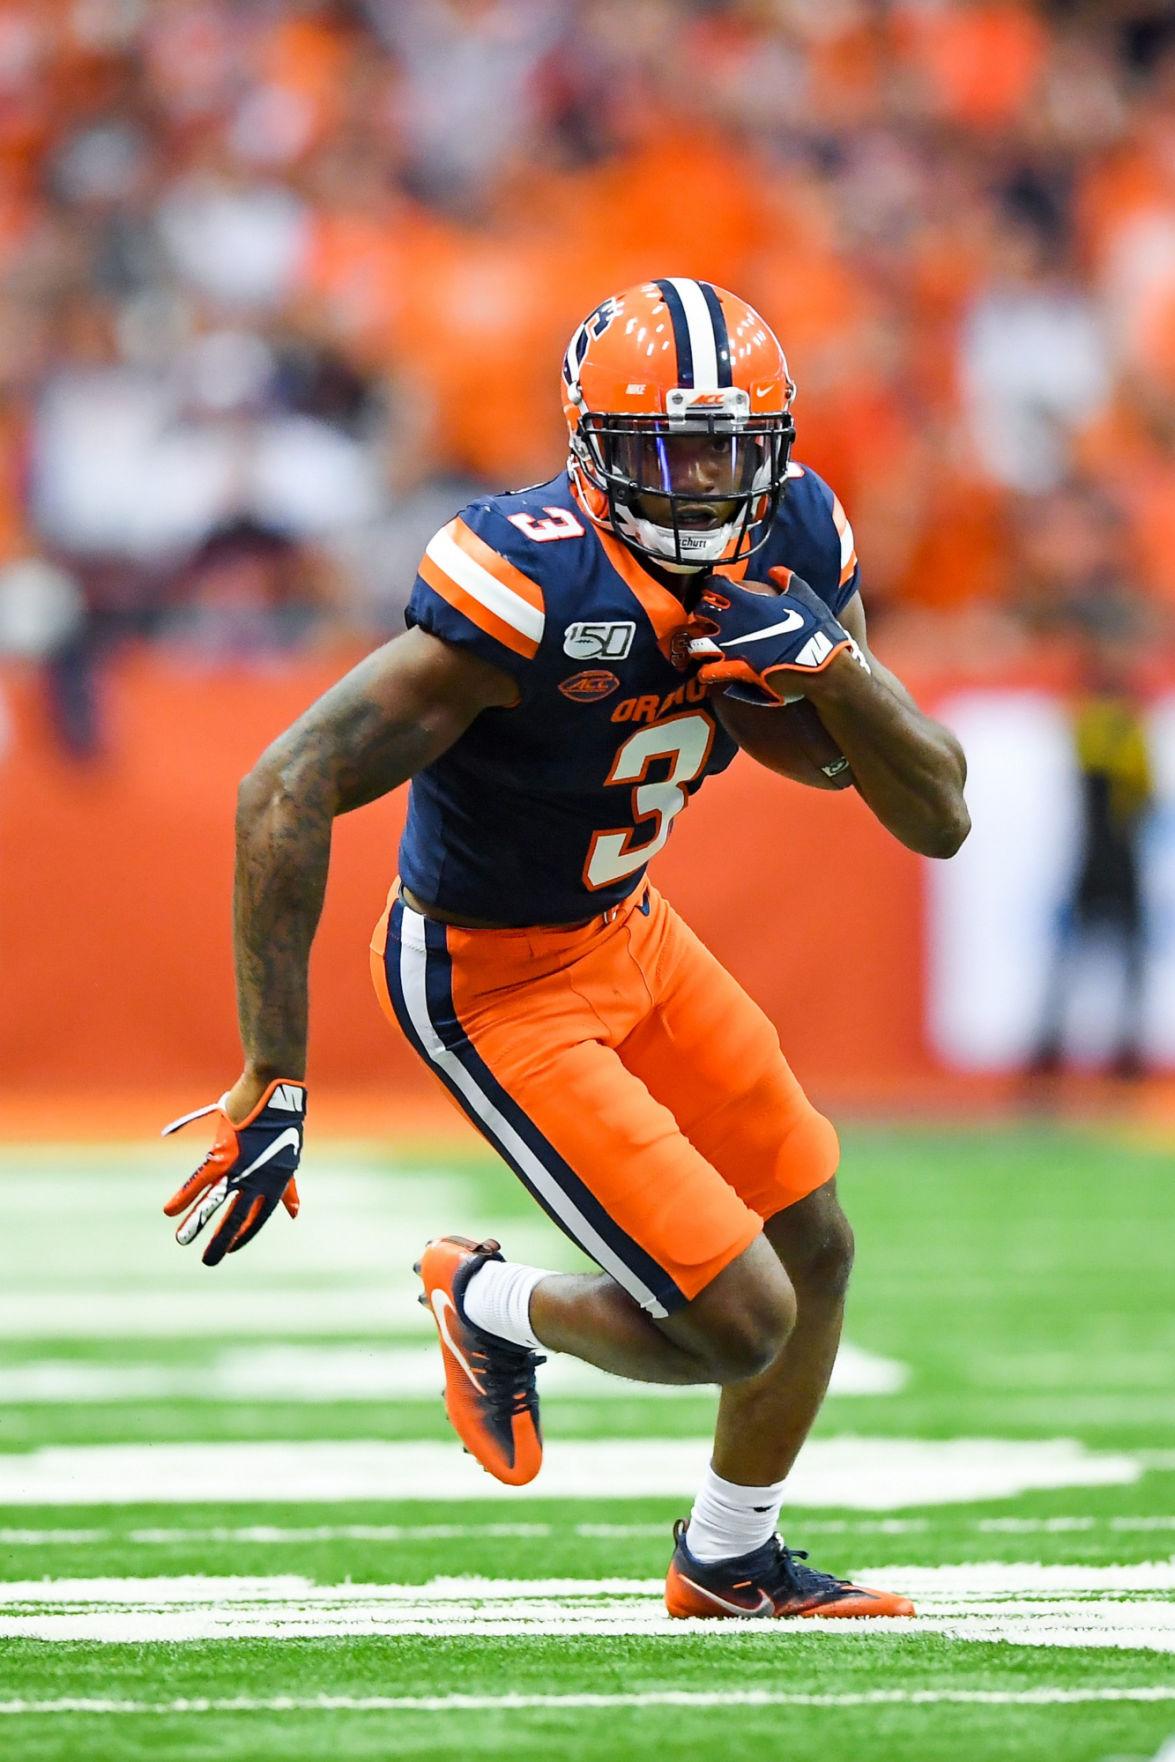 Syracuse's Frederick focuses on consistency